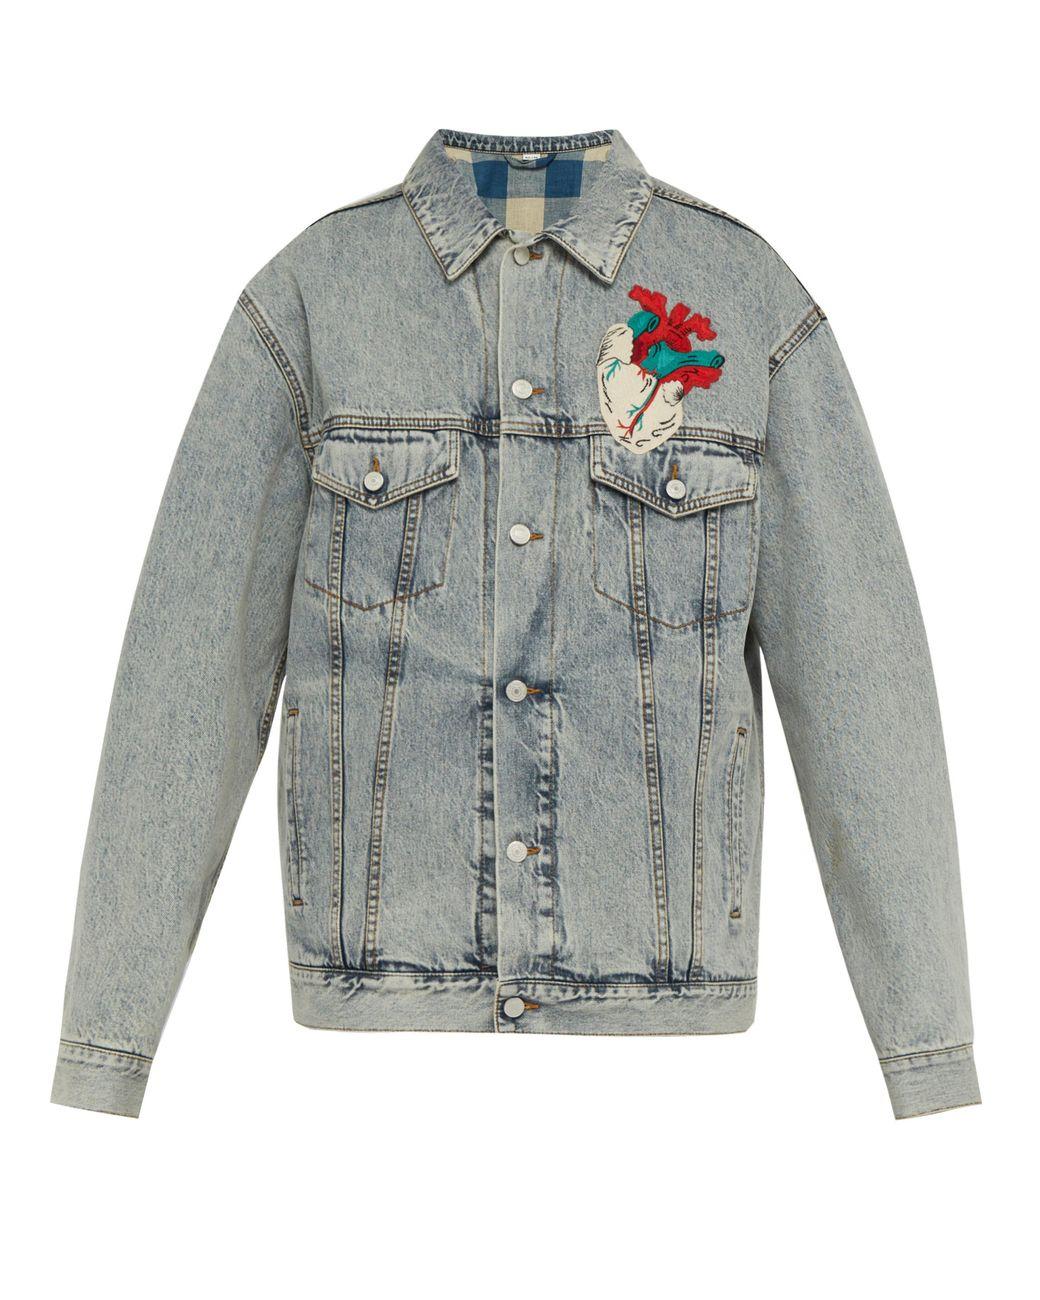 601837c7058 Gucci Heart Appliqué Oversized Denim Jacket in Blue for Men - Lyst